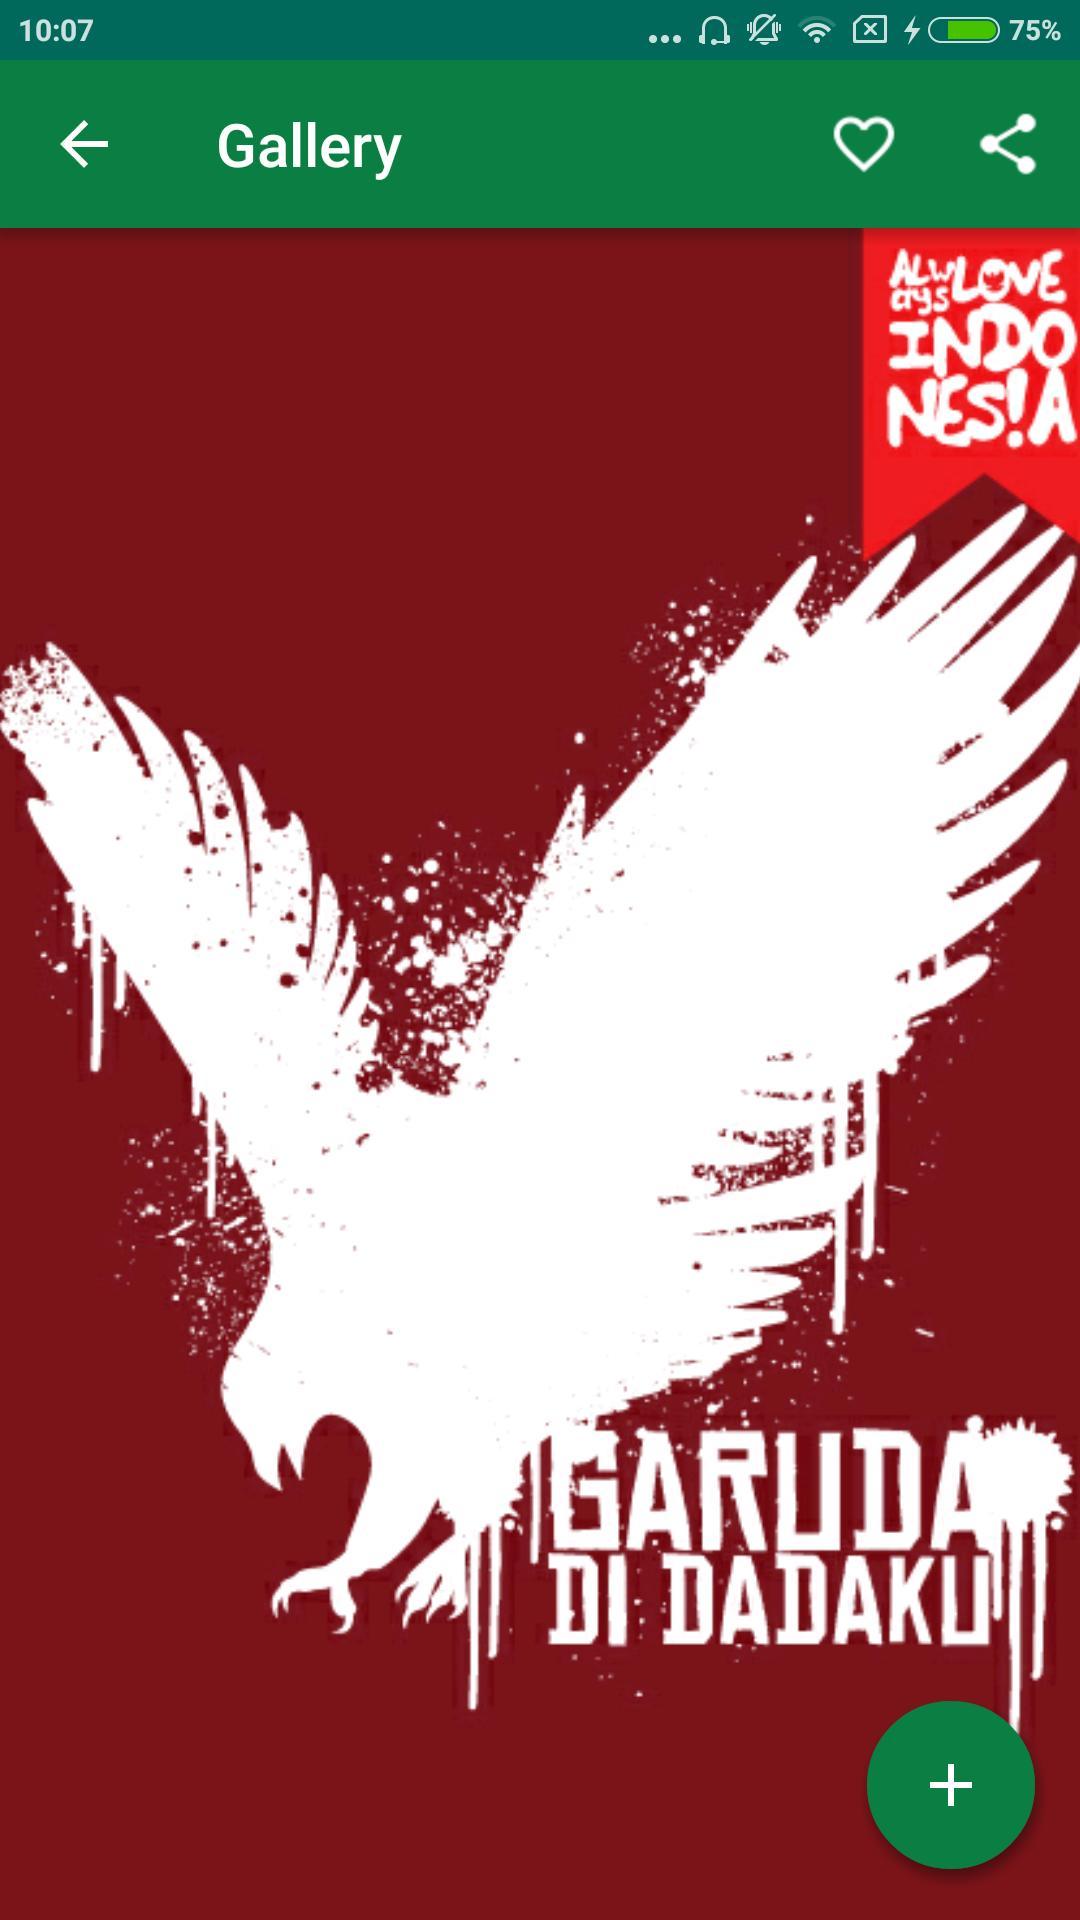 Garuda Di Dadaku Wallpaper Pour Android Telechargez L Apk